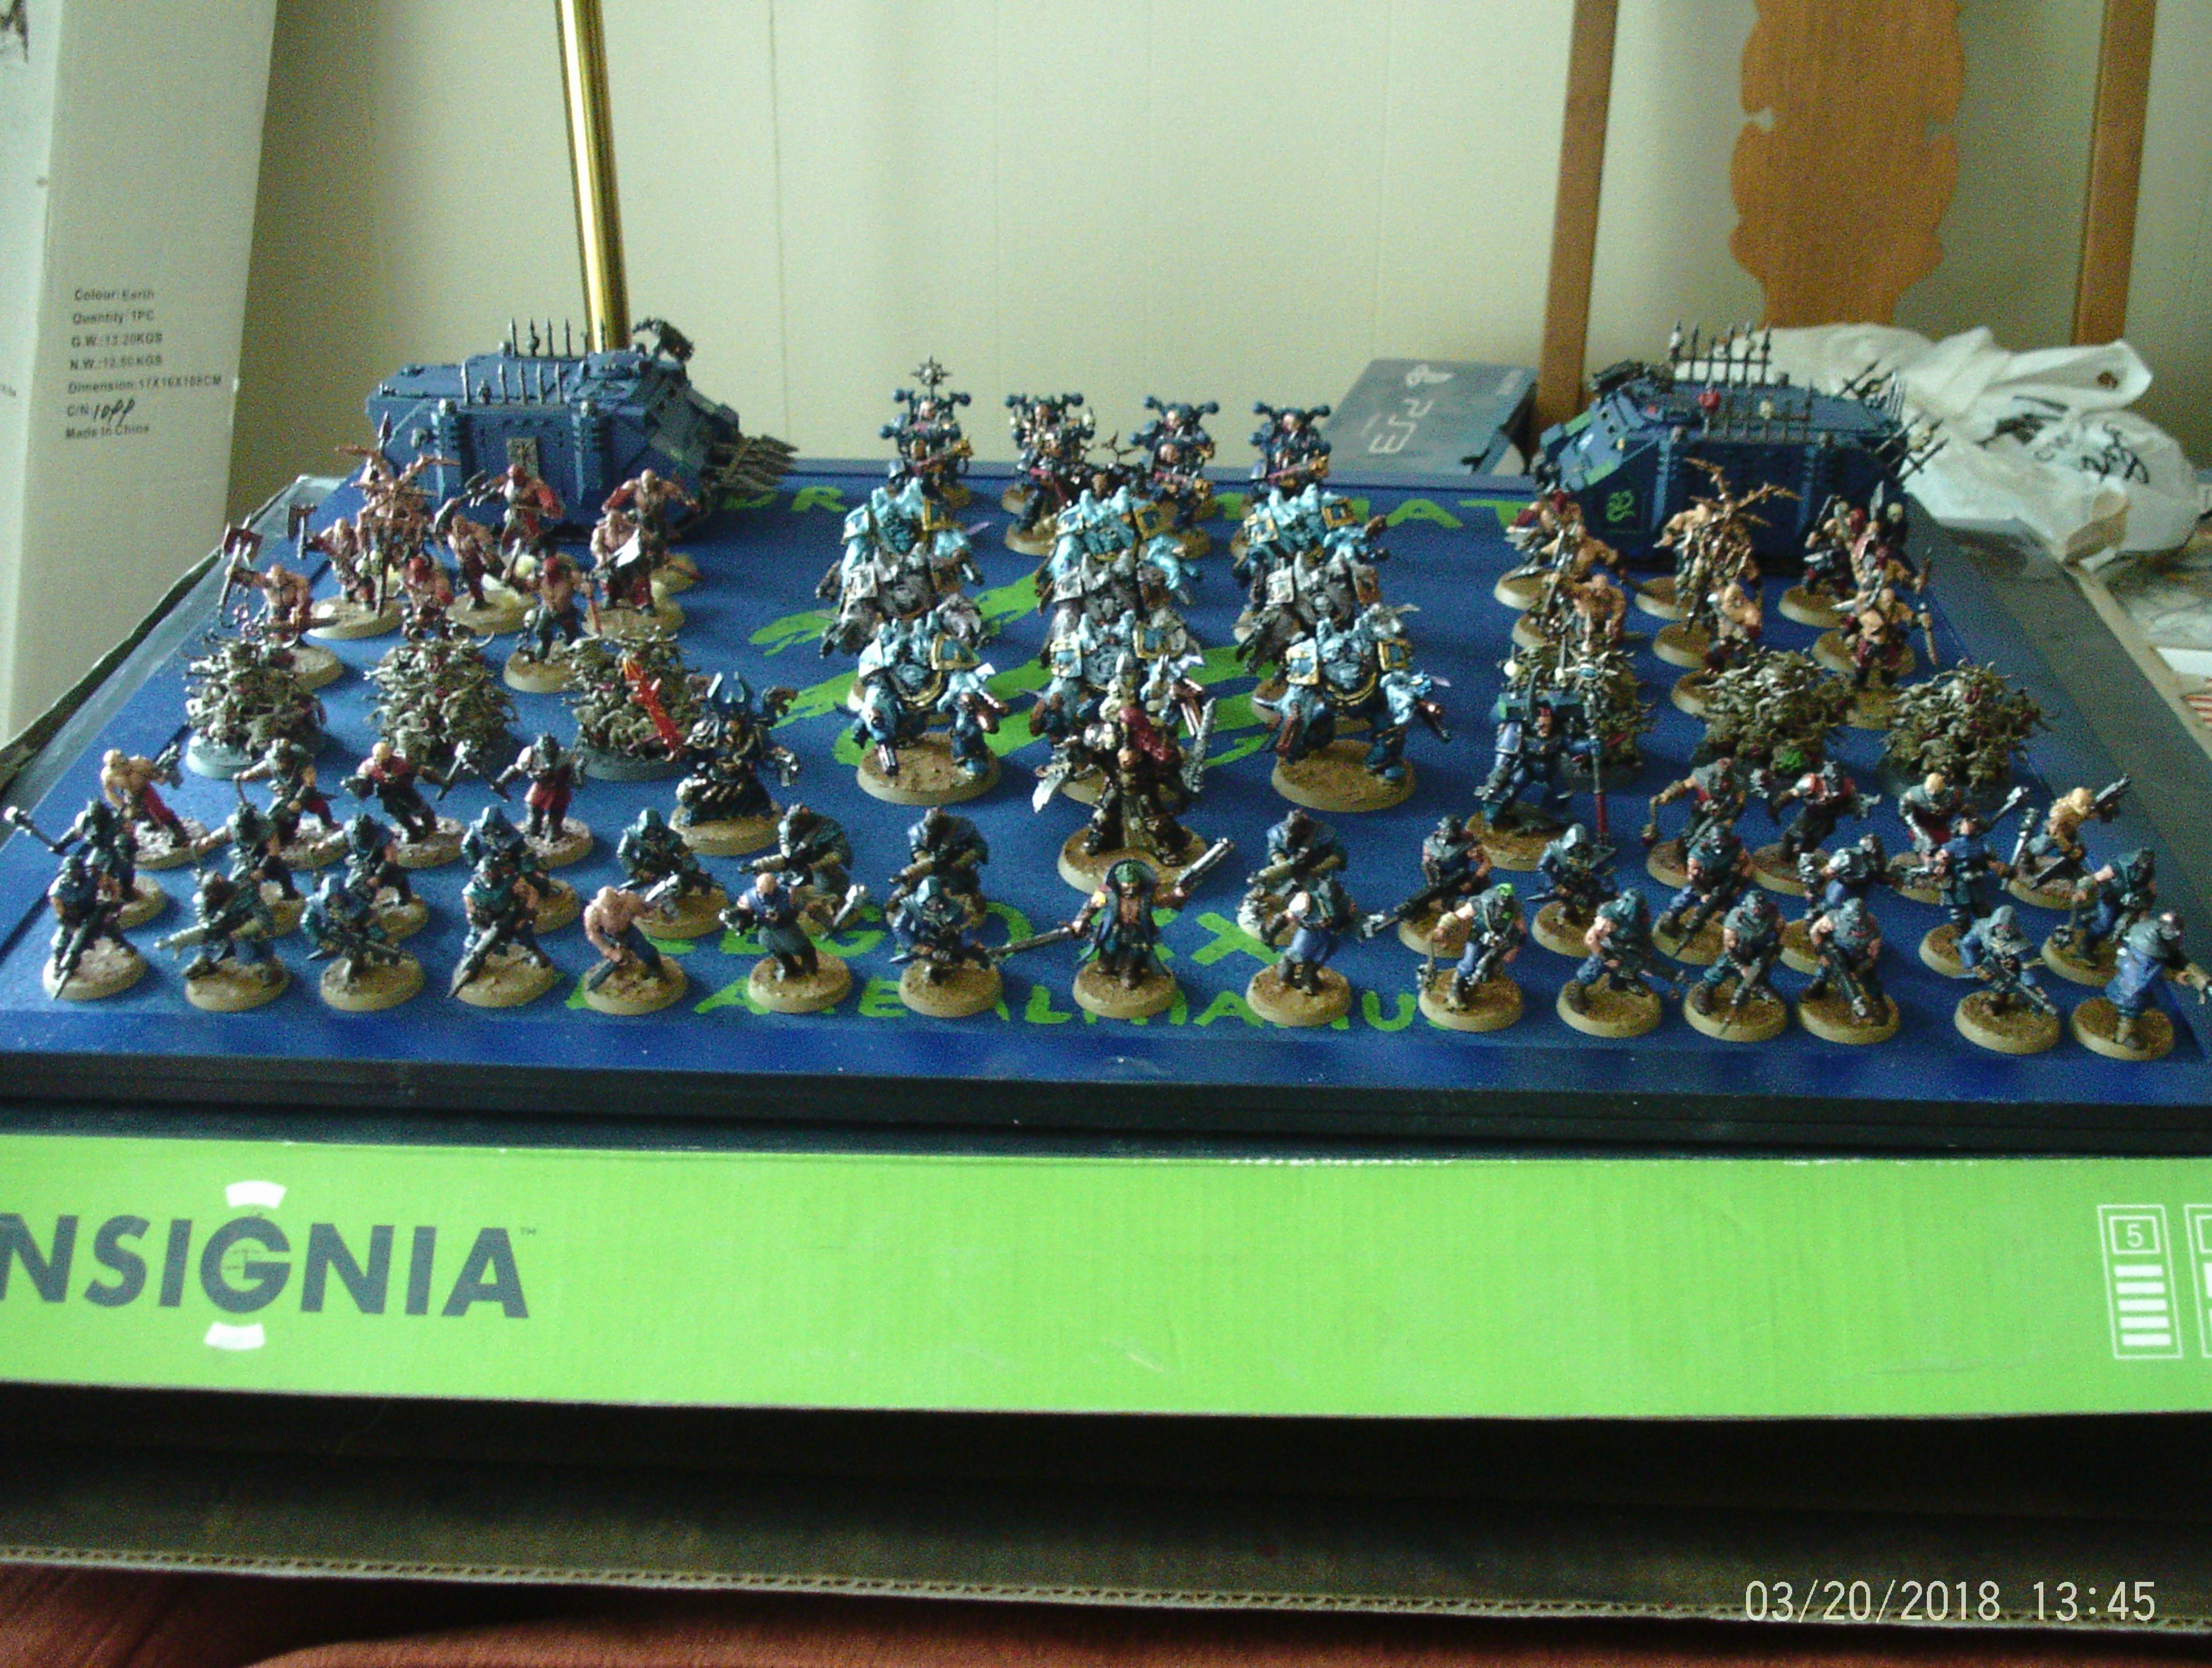 Abaddon, Alpha, Army, Black, Chaos, Daemons, Khorne, Legion, Prince, Slaanesh, Sorcerer